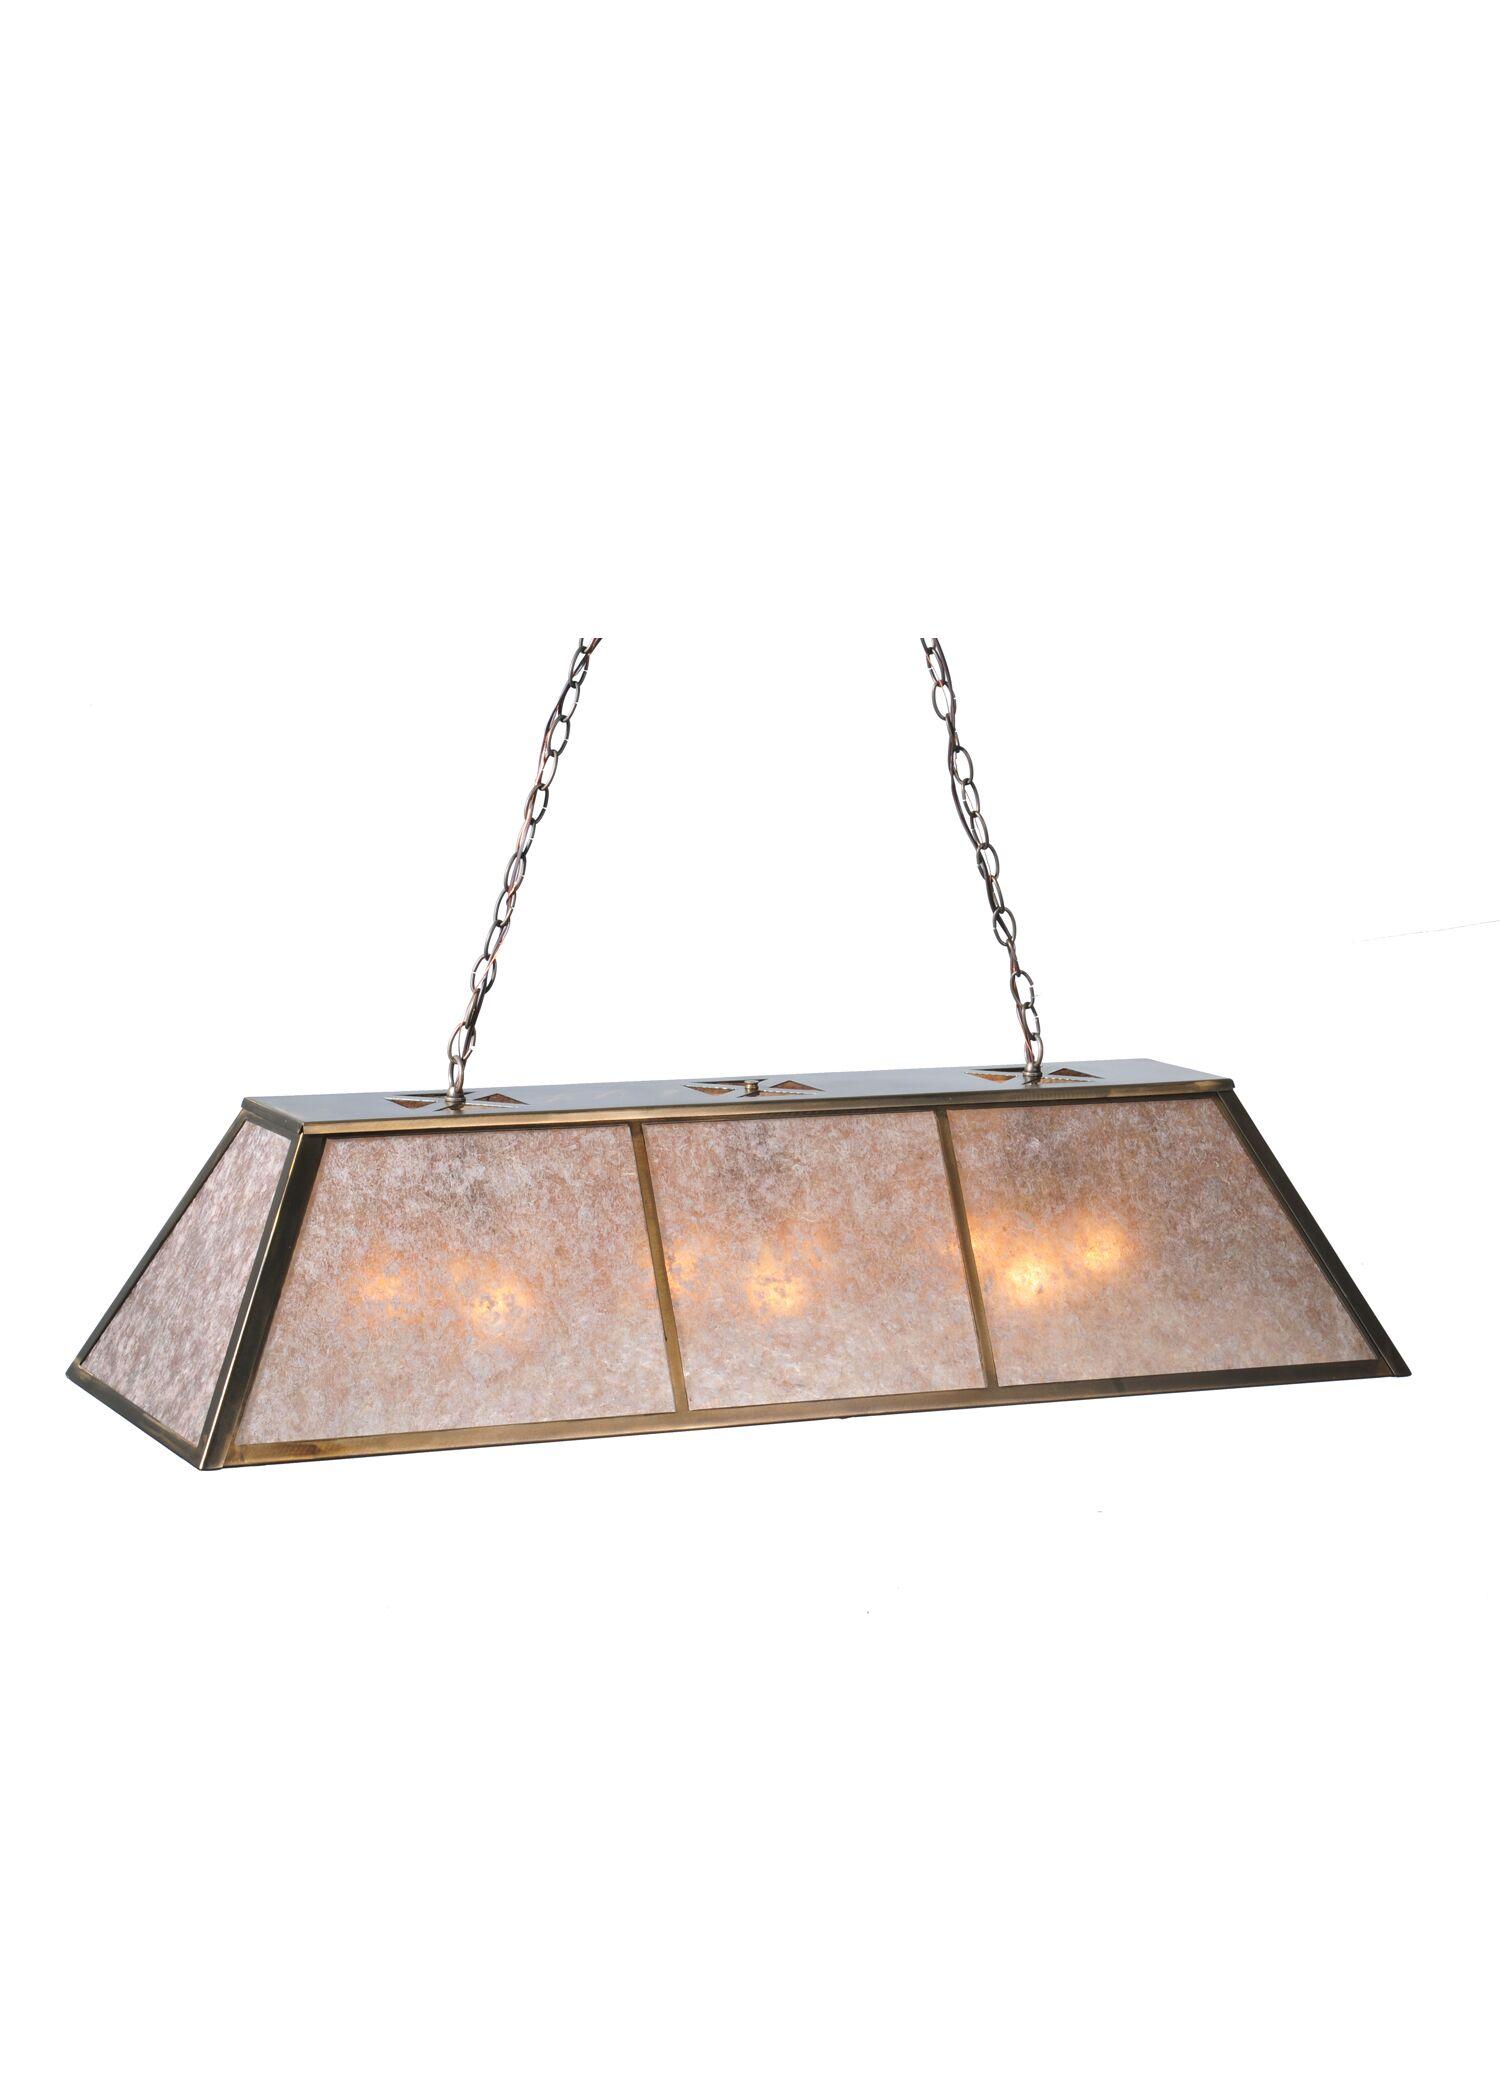 Tri-Panel 9-Light Pool Table Lights Pendant Size: 45